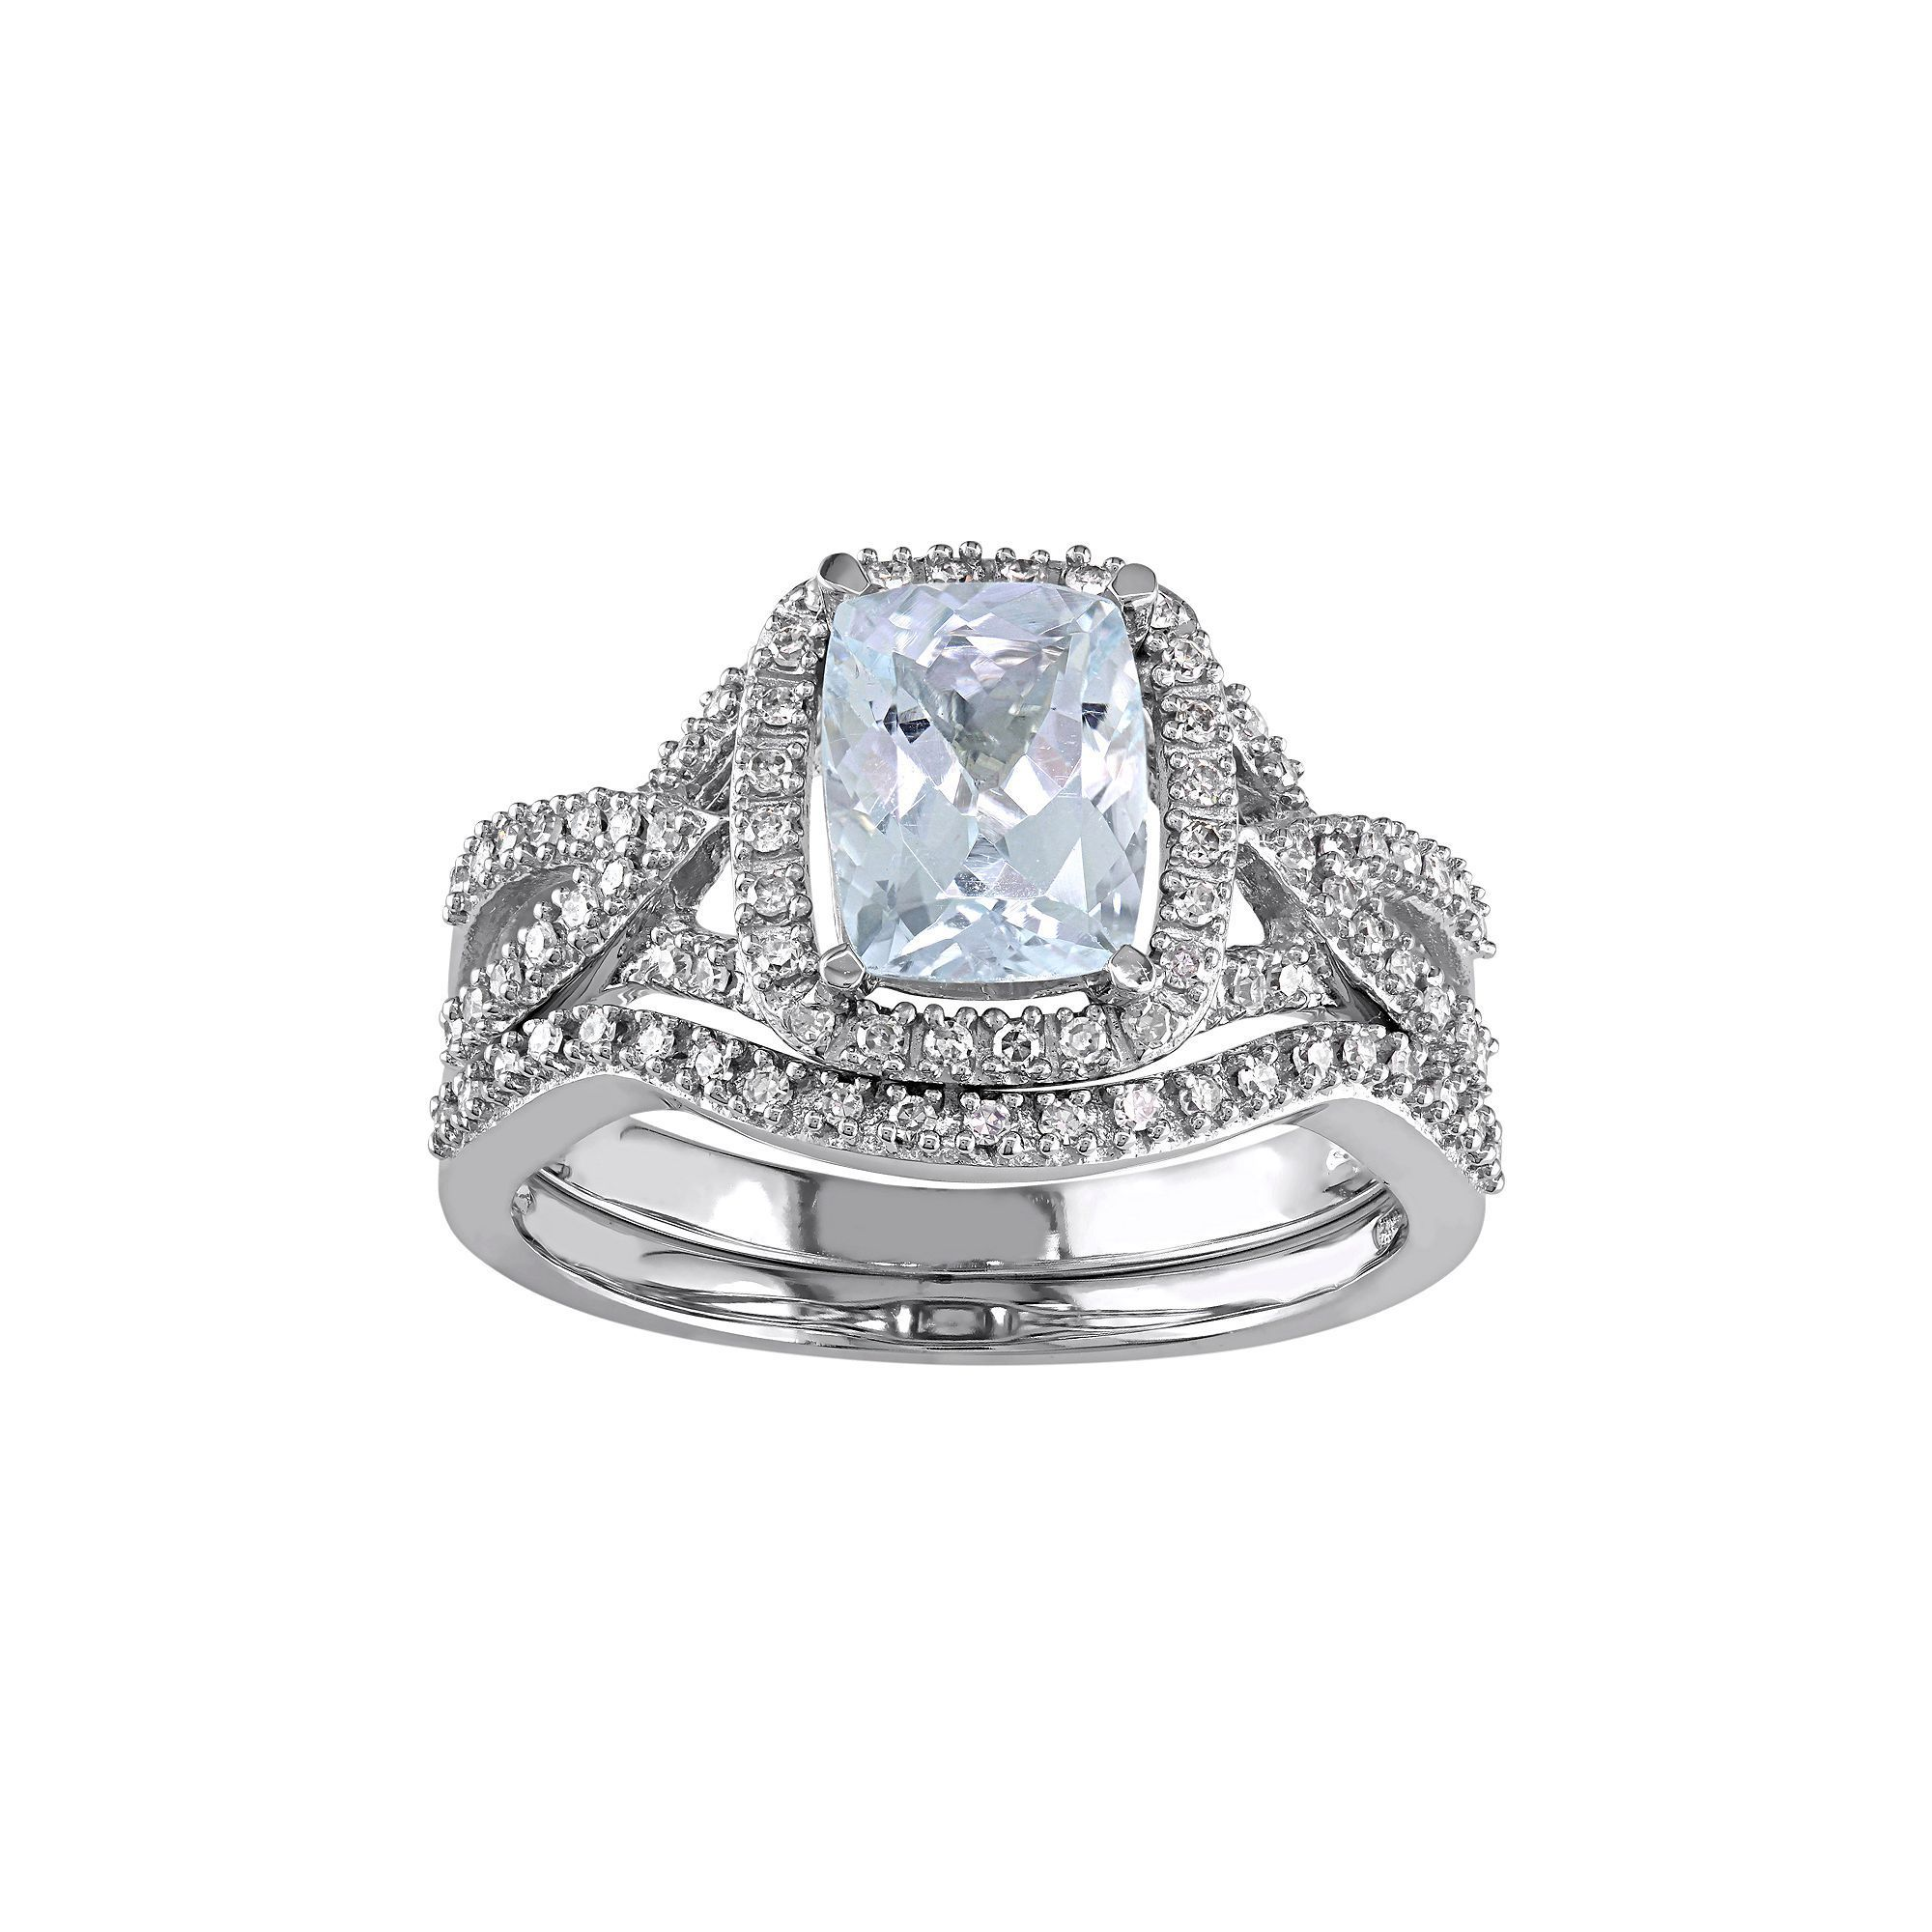 10k White Gold Aquamarine & 1/4 Carat T.W. Diamond Engagement Ring Set, Blue